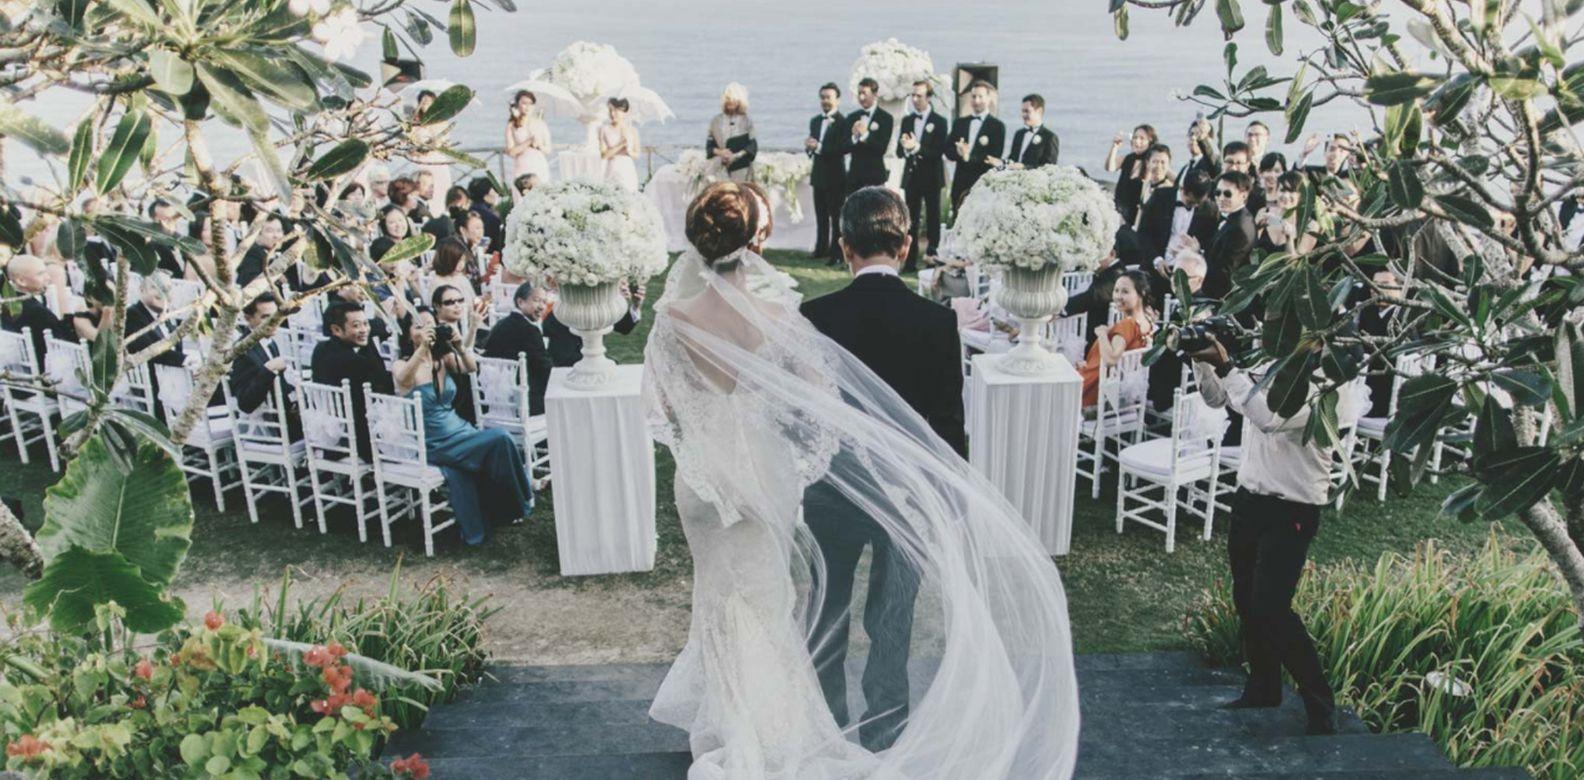 7 Top Wedding Planners In Hong Kong Hong Kong Tatler